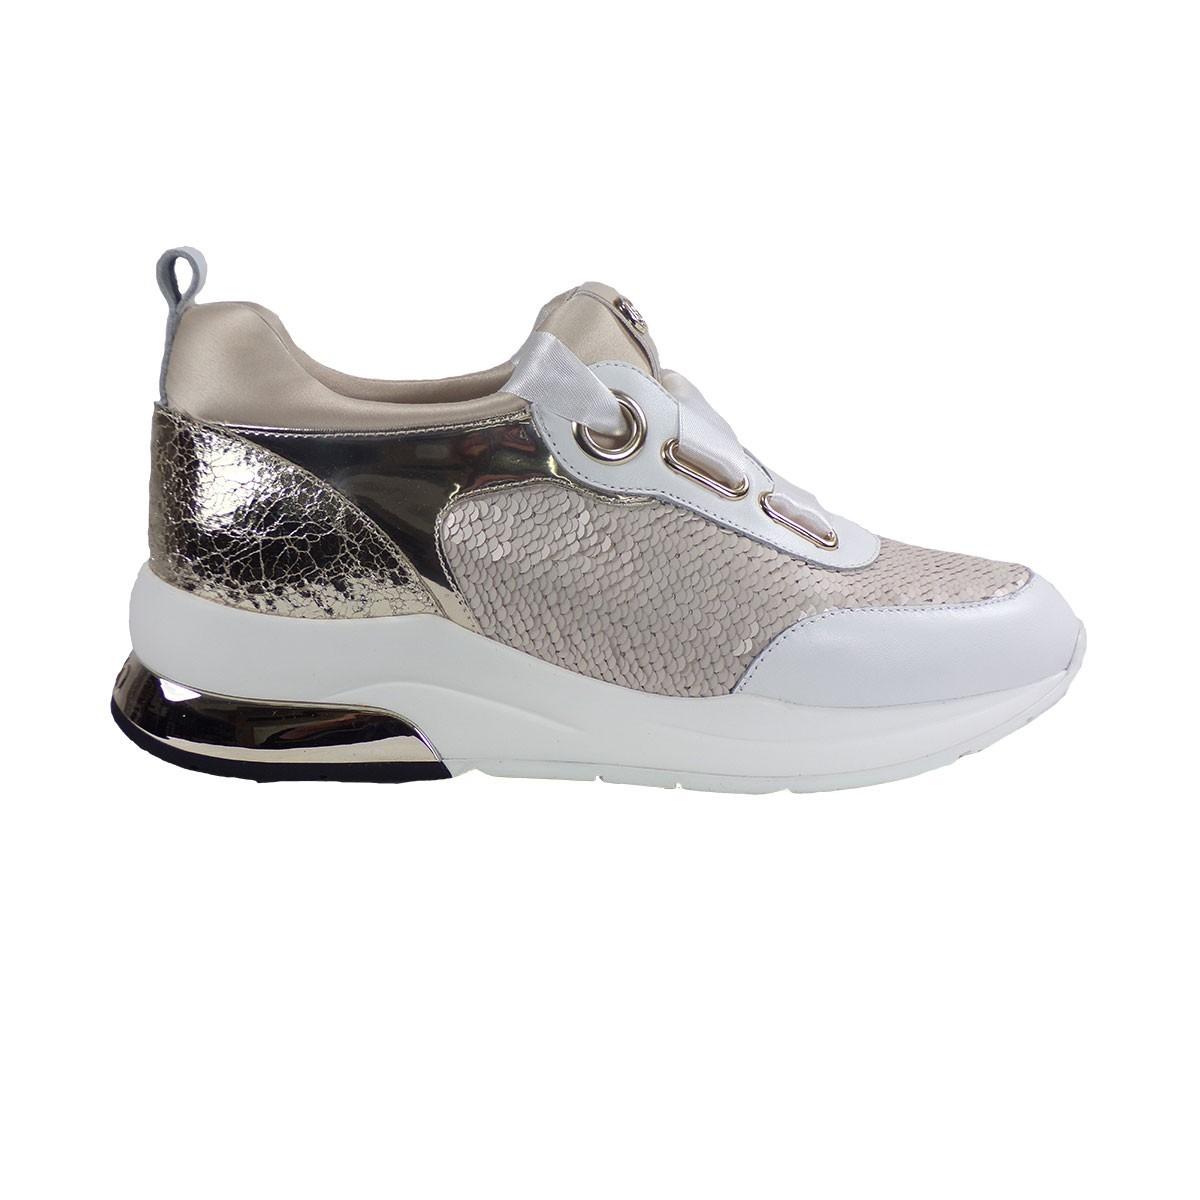 9a411c8d404 Liu-Jo Sneakers Παπούτσια Γυναικεία B18013 Nude – IShoeStore